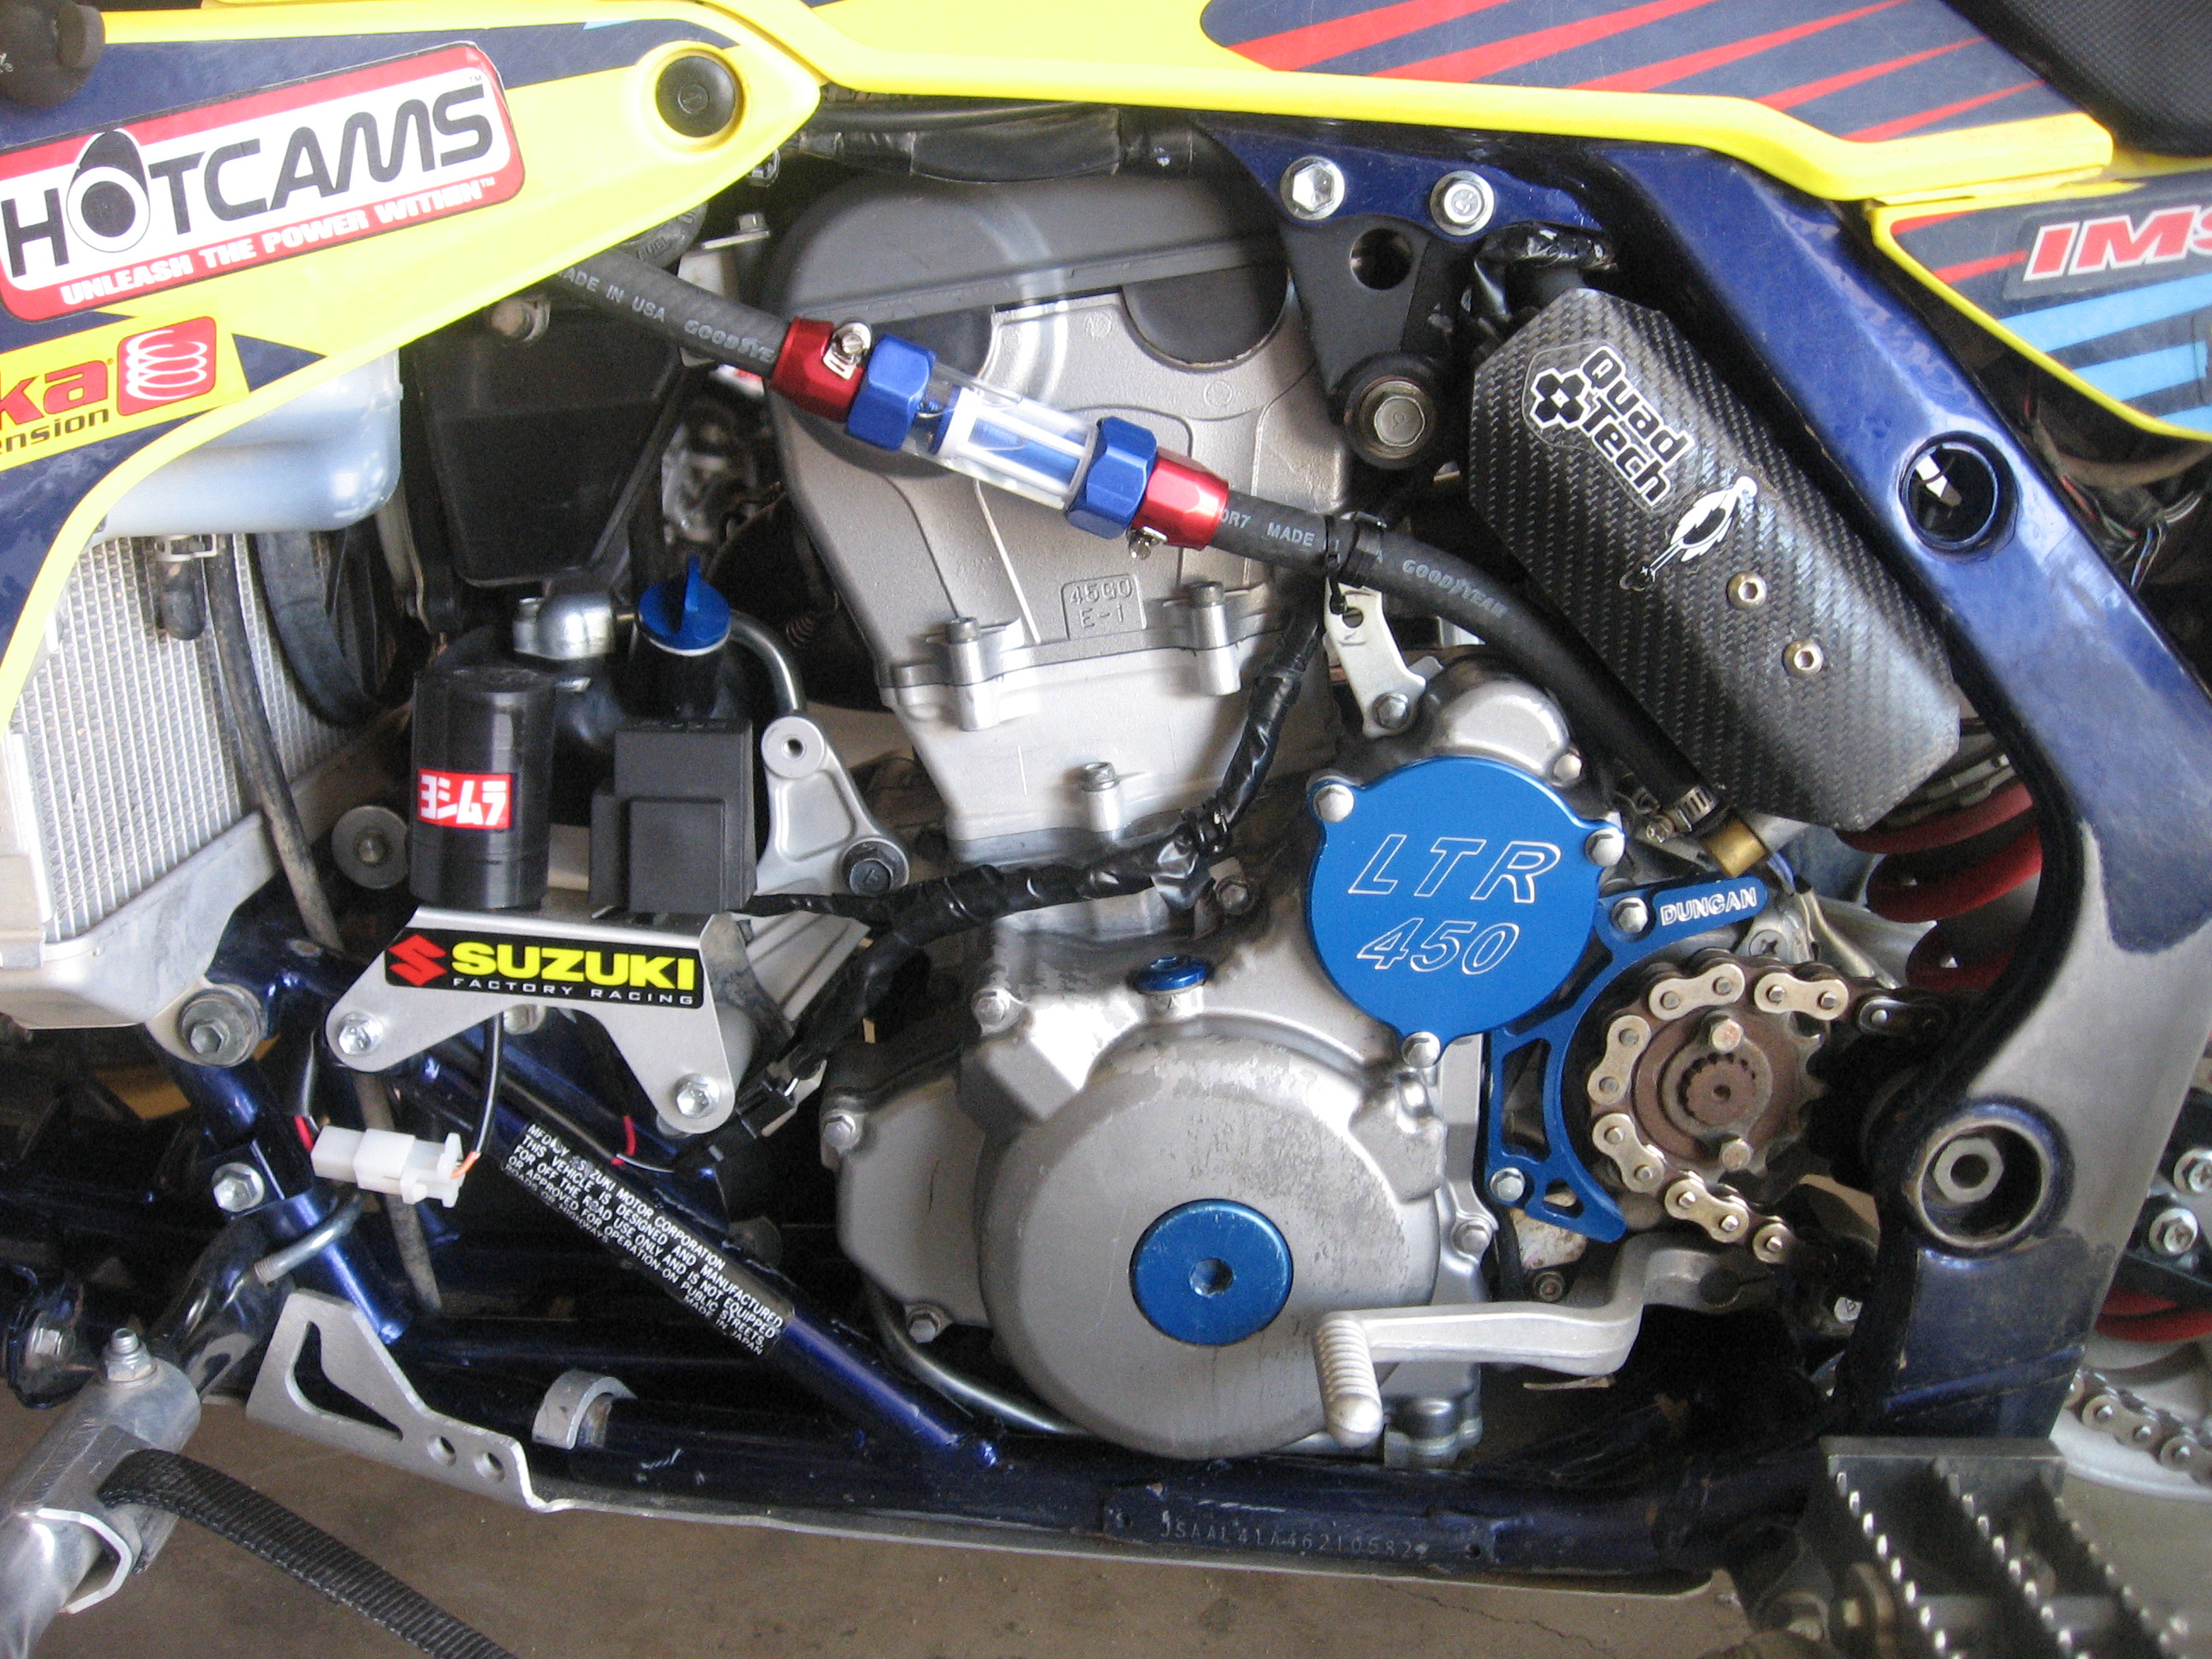 Aftermarket Fuel Filter Suzuki Lt R450 Forum Engine Filters Click Image For Larger Version Name Img 0072 Views 3051 Size 155